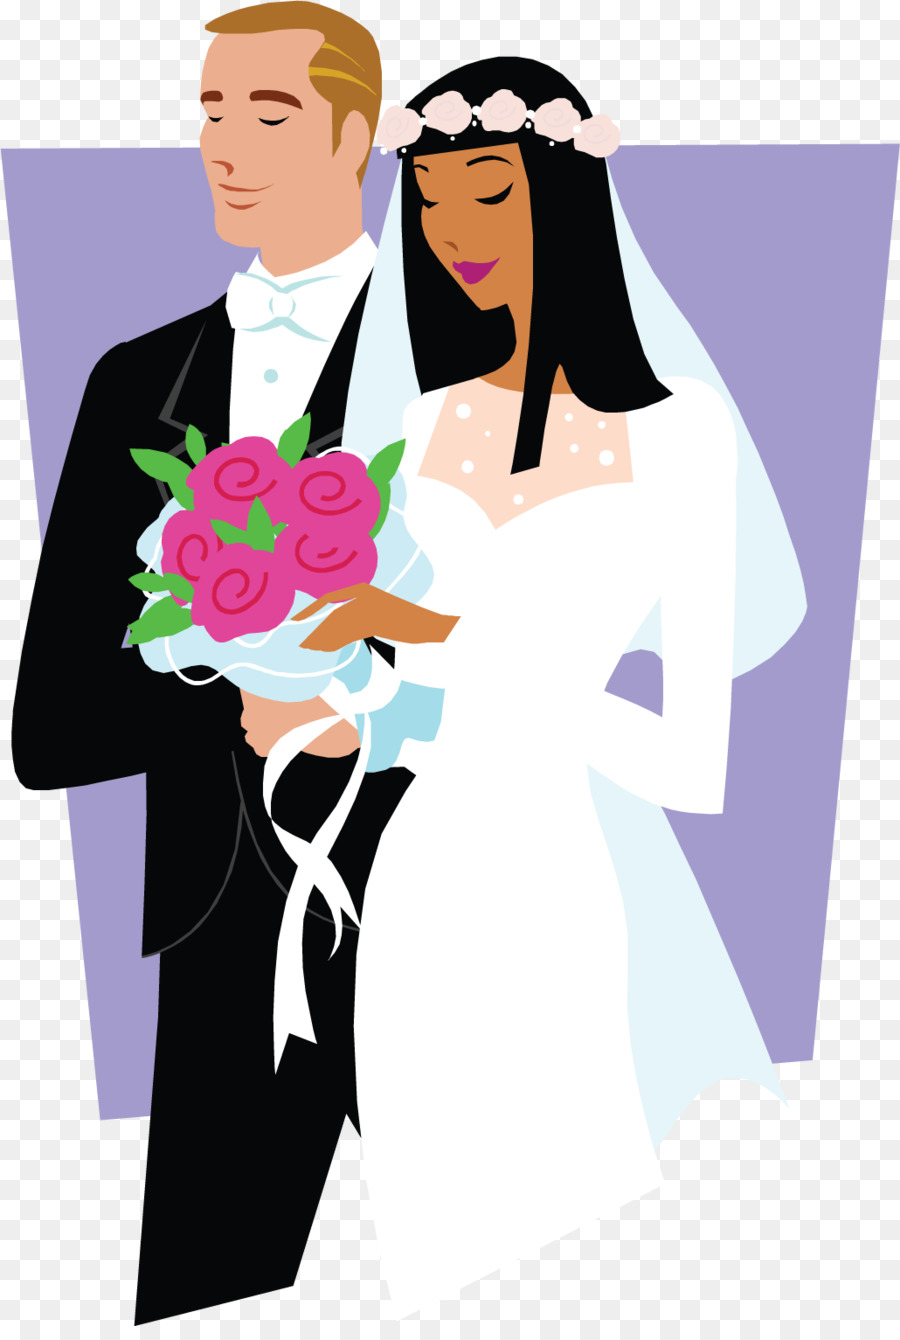 Matrimonio Catolico Para Niños : Jesús matrimonio sacramentos de la iglesia católica